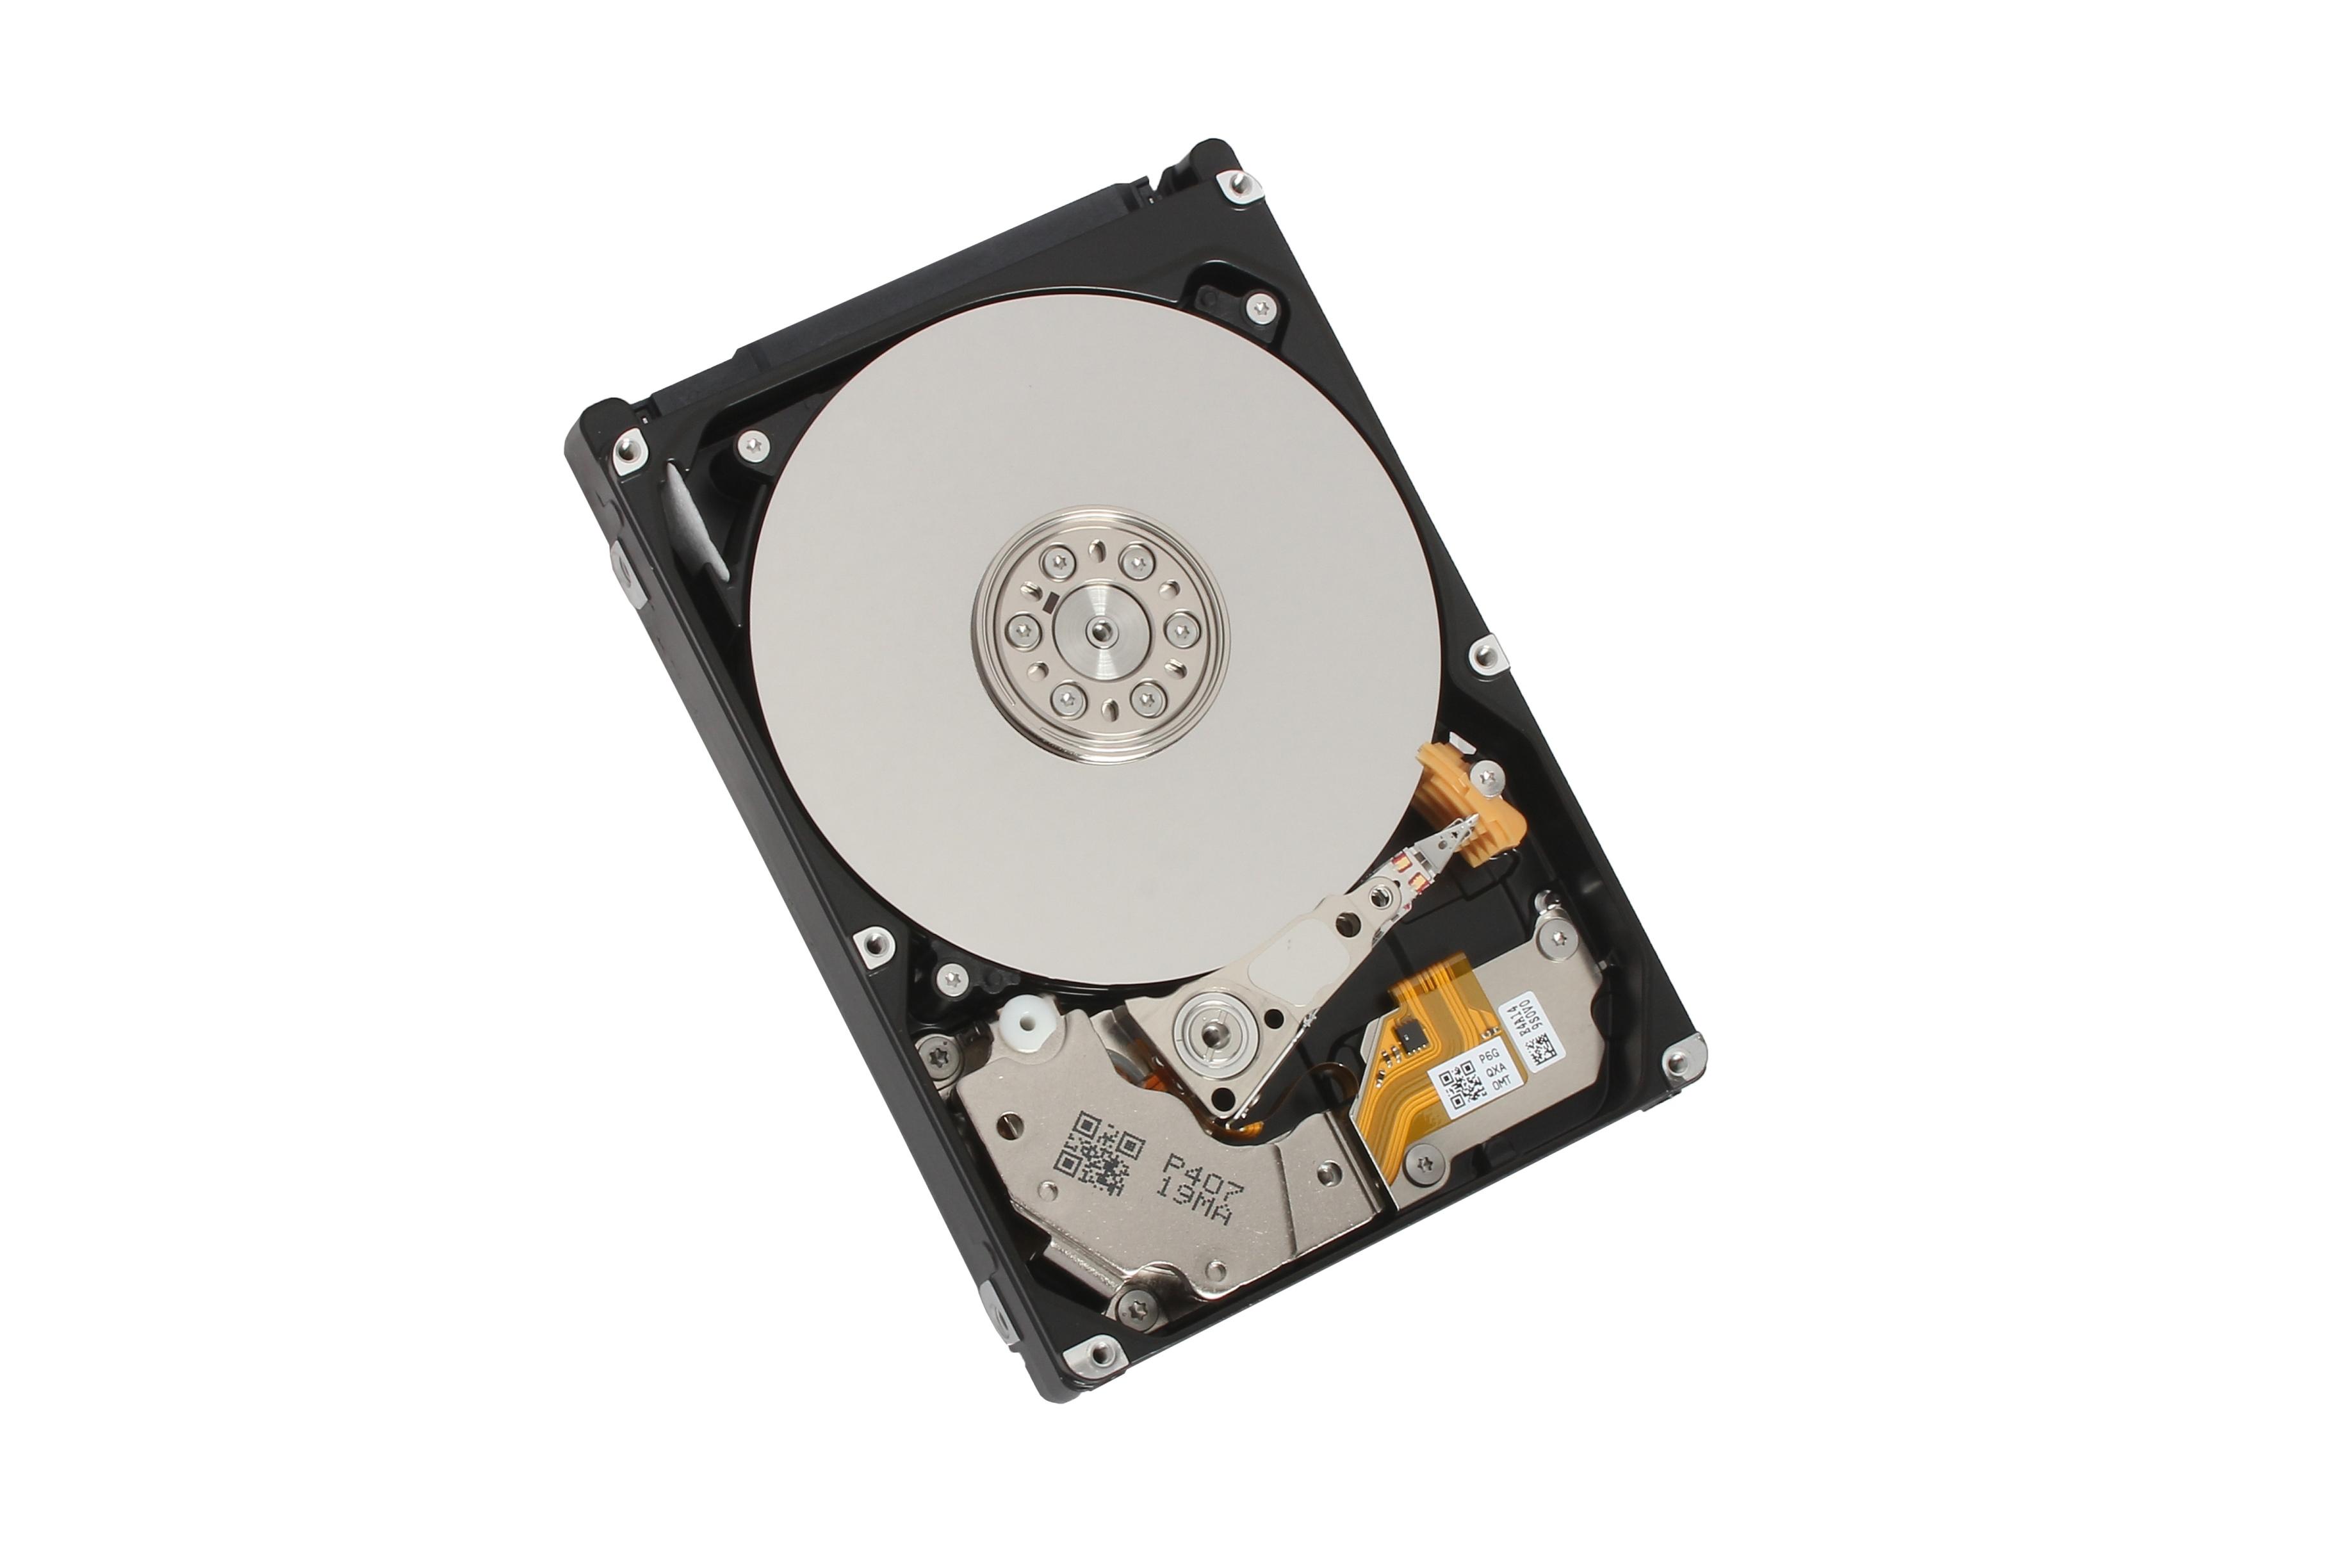 TOSHIBA 推出新一代企業級效能型硬碟AL14SE系列  搭載10,500 RPM高轉速且支援SAS 12Gbit/s介面